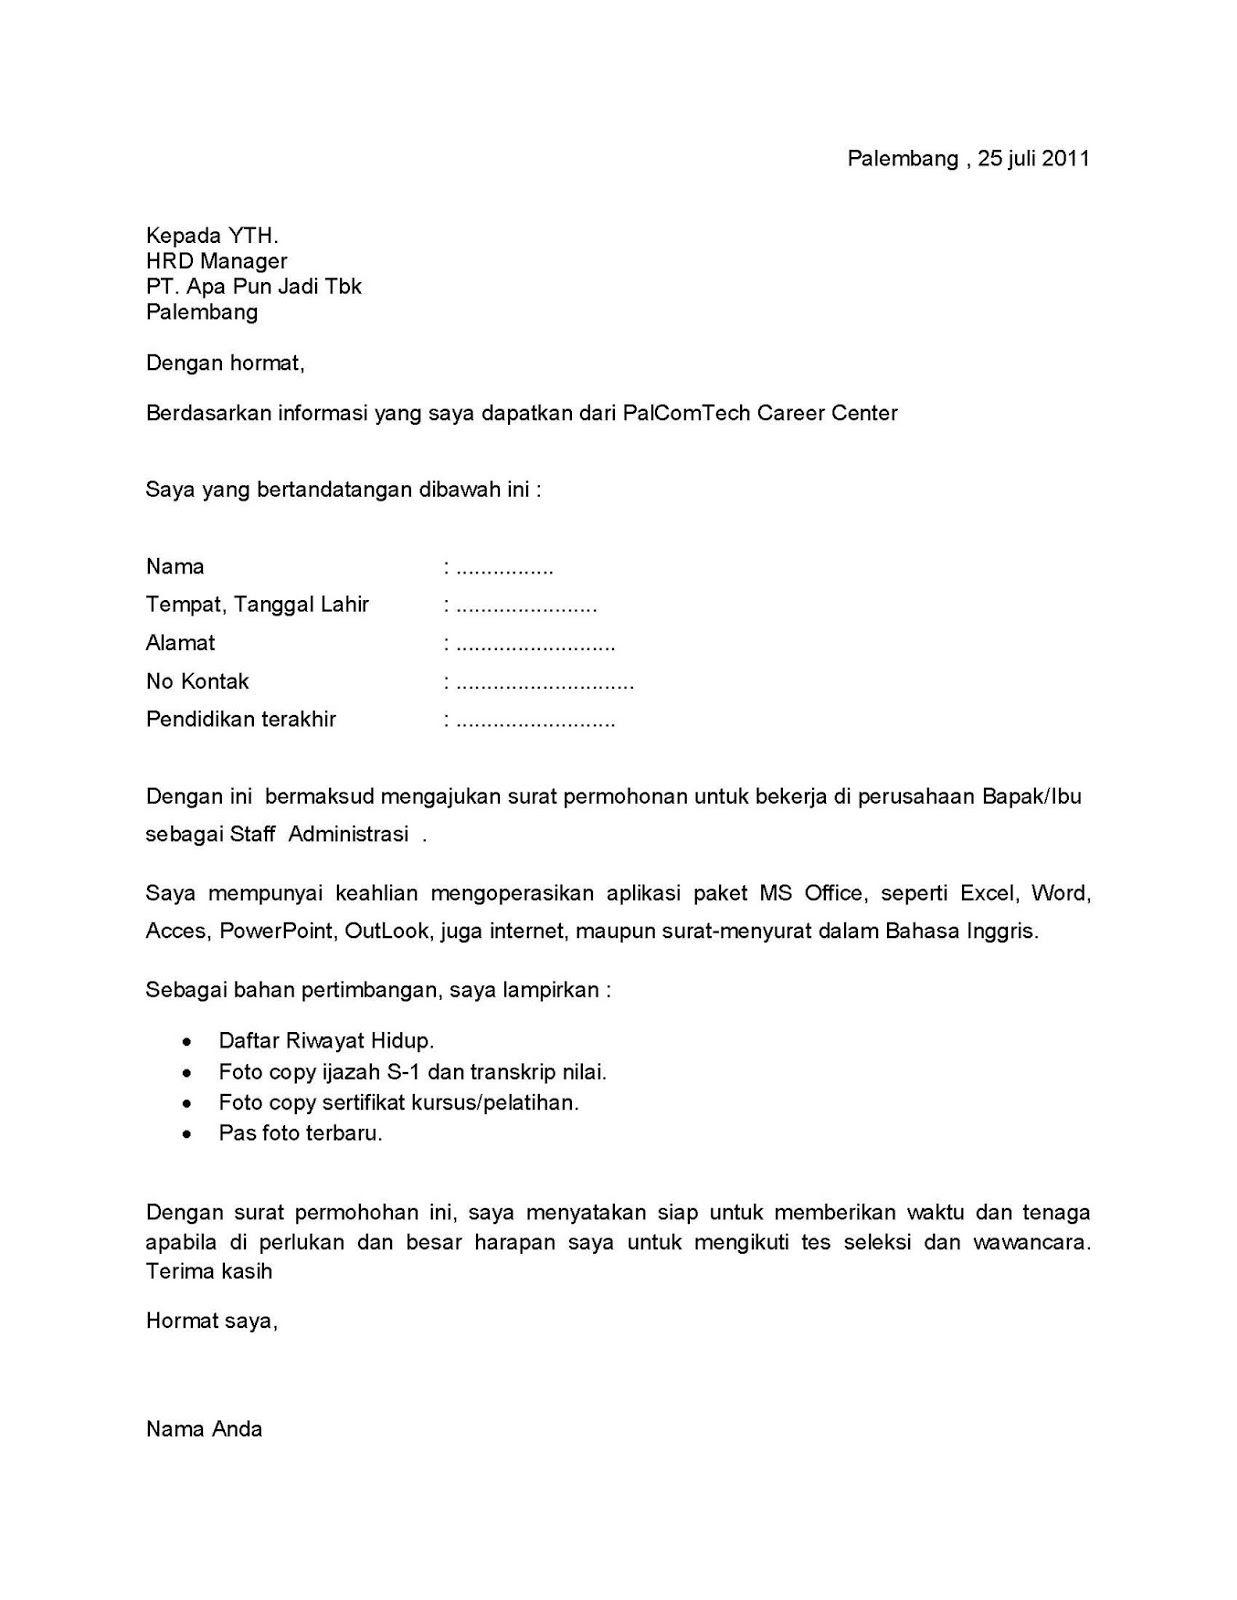 Surat Lamaran Kerja Pegadaian ben jobs Surat